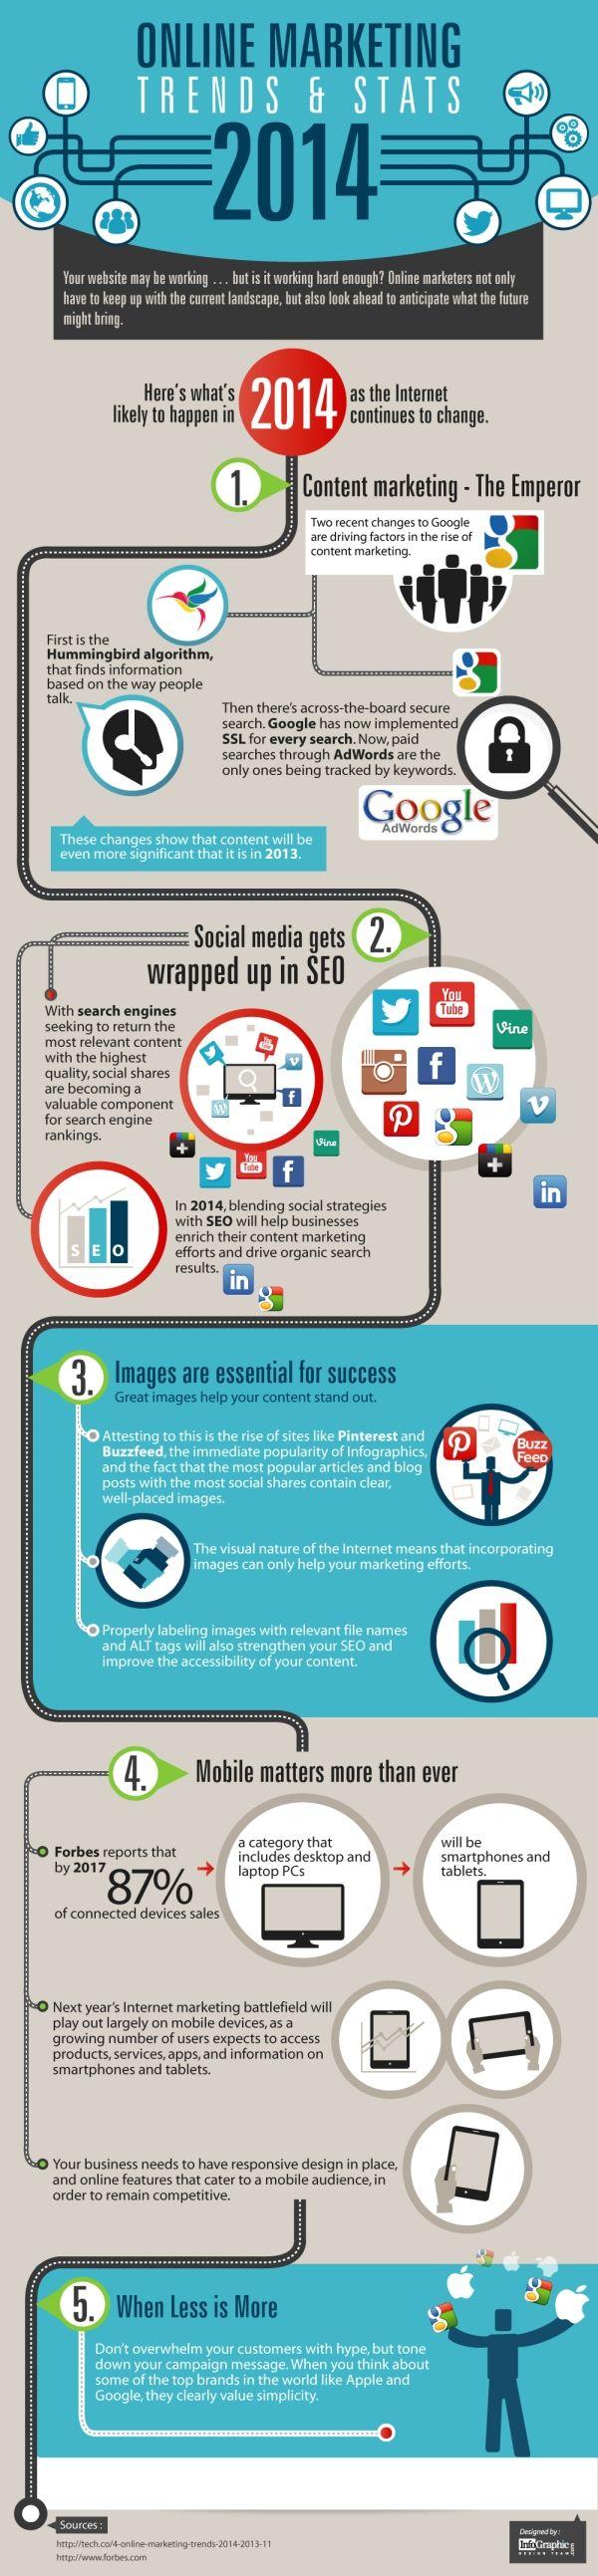 Content, Social, Mobile Digital Marketing Trends For 2014 #mobile #smartphone #youtube #twitter #pinterest #vine